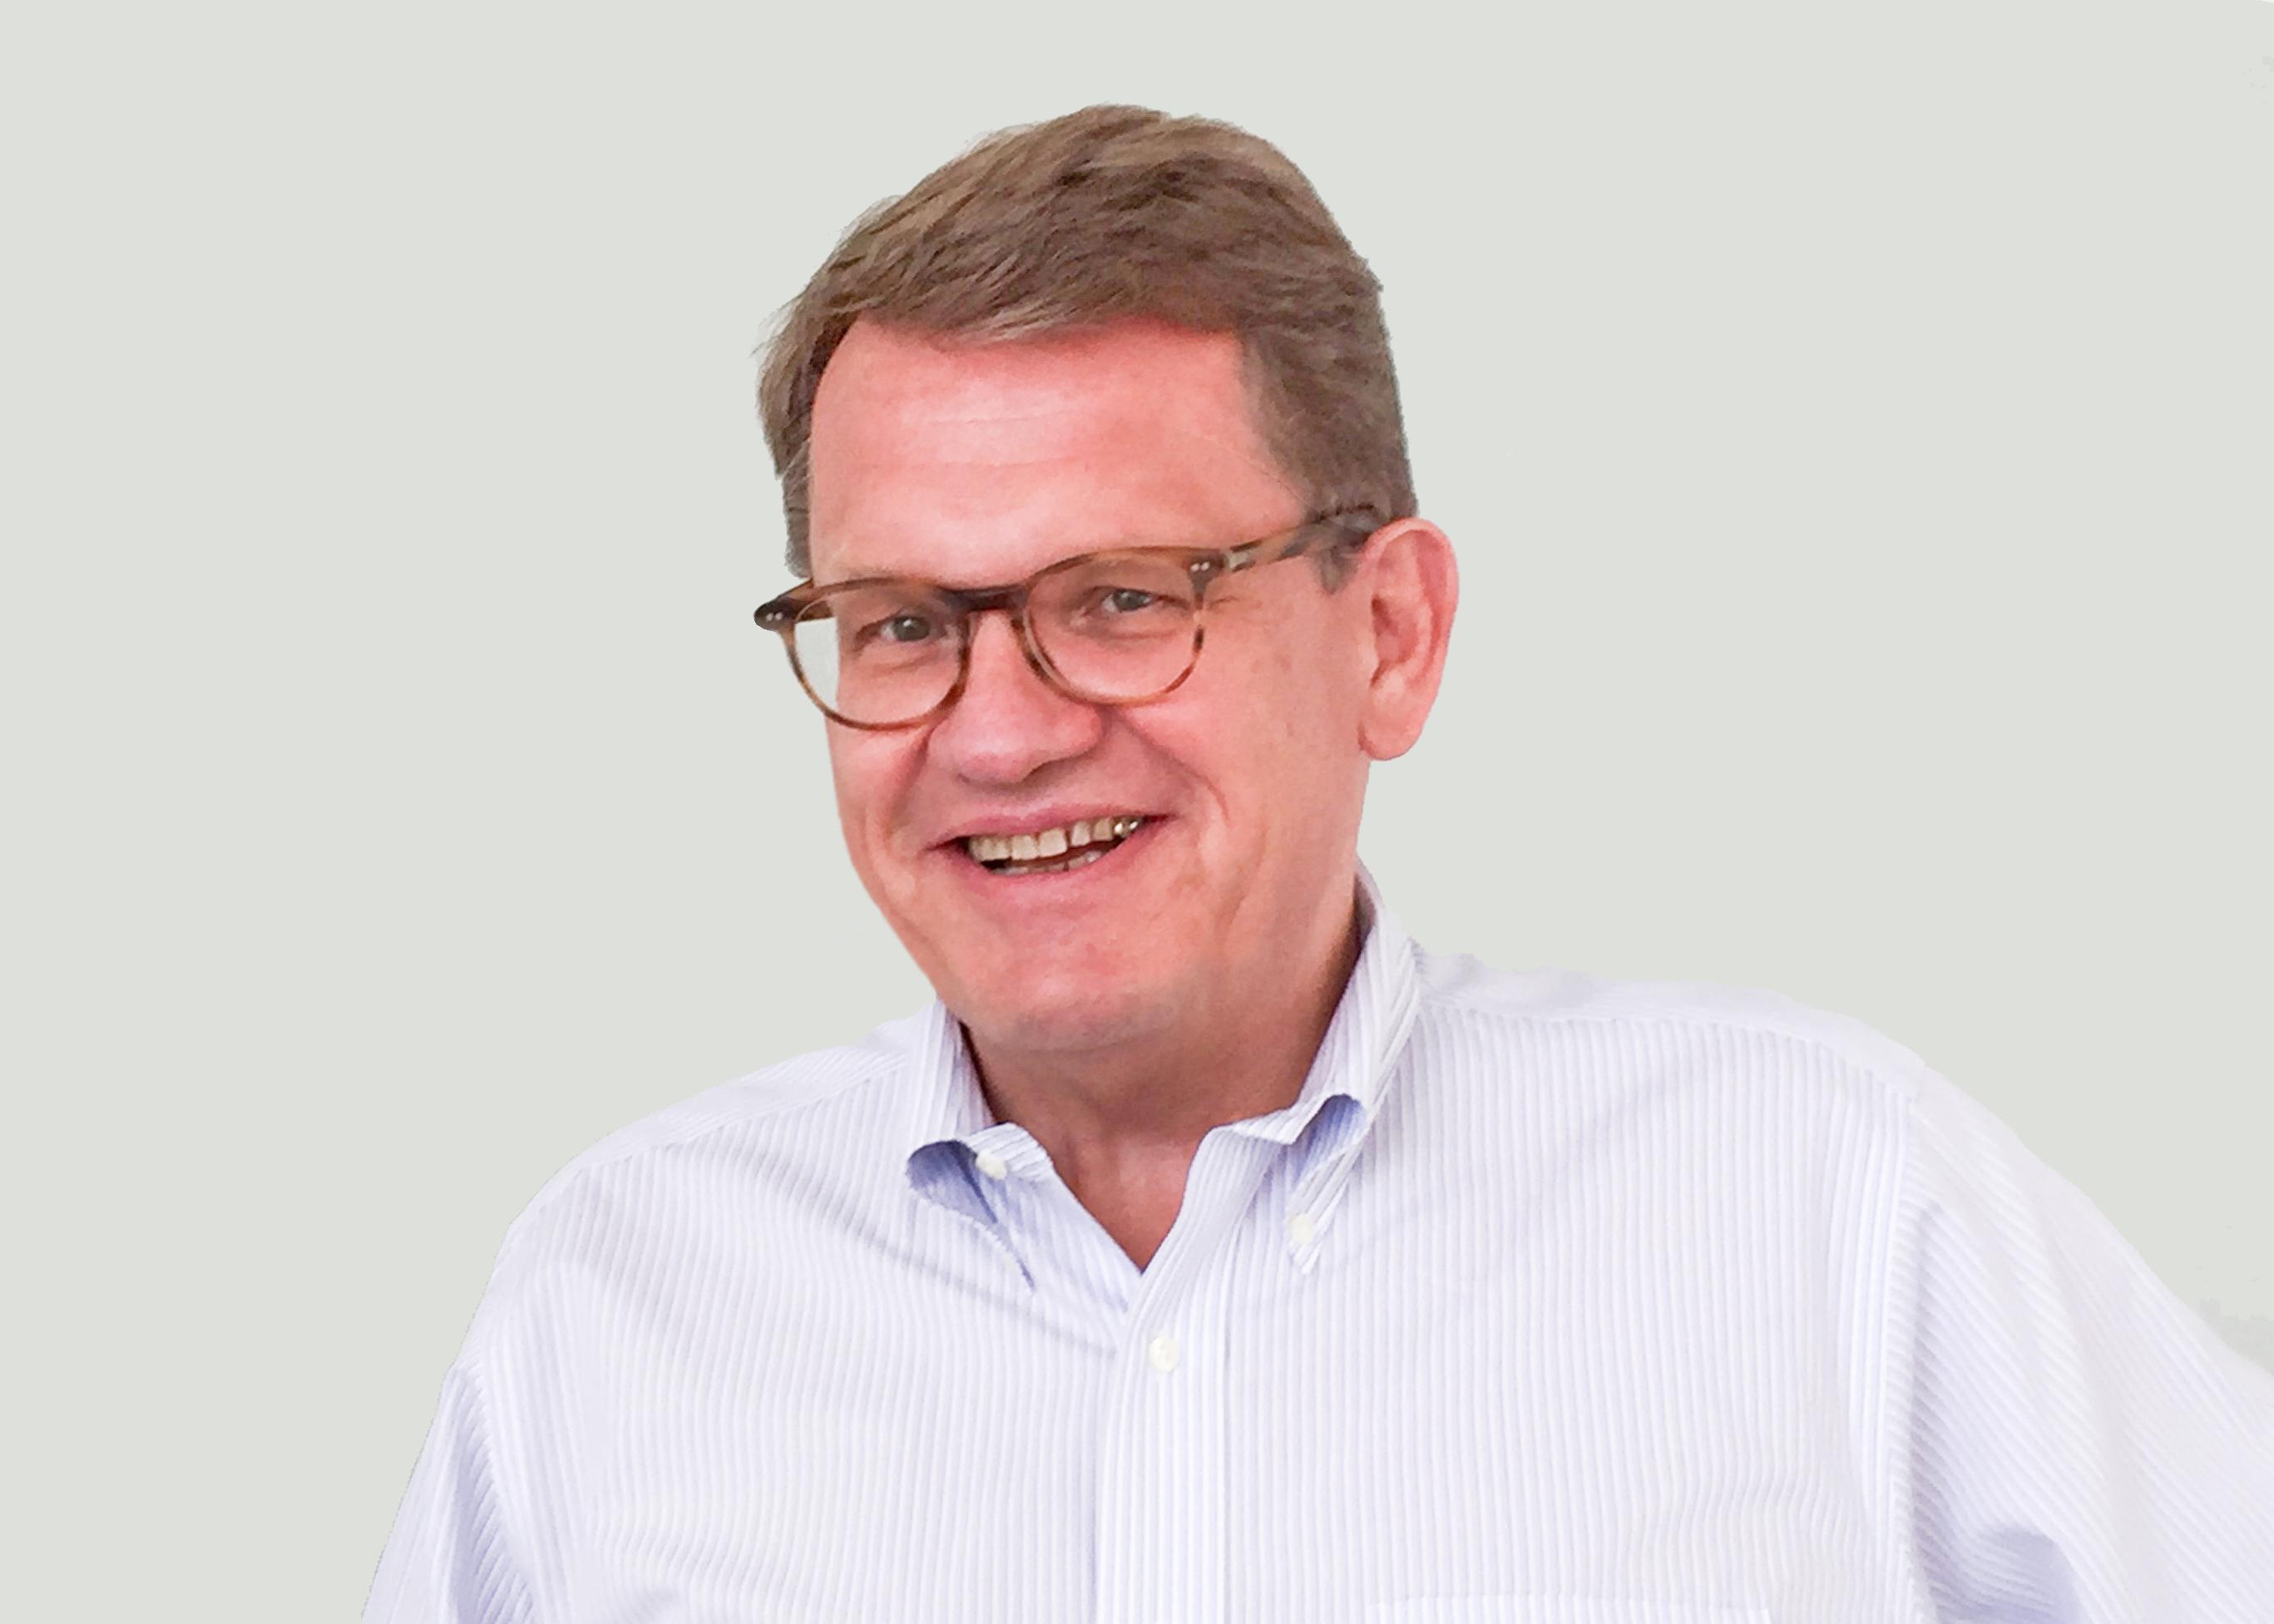 Uwe Raschke